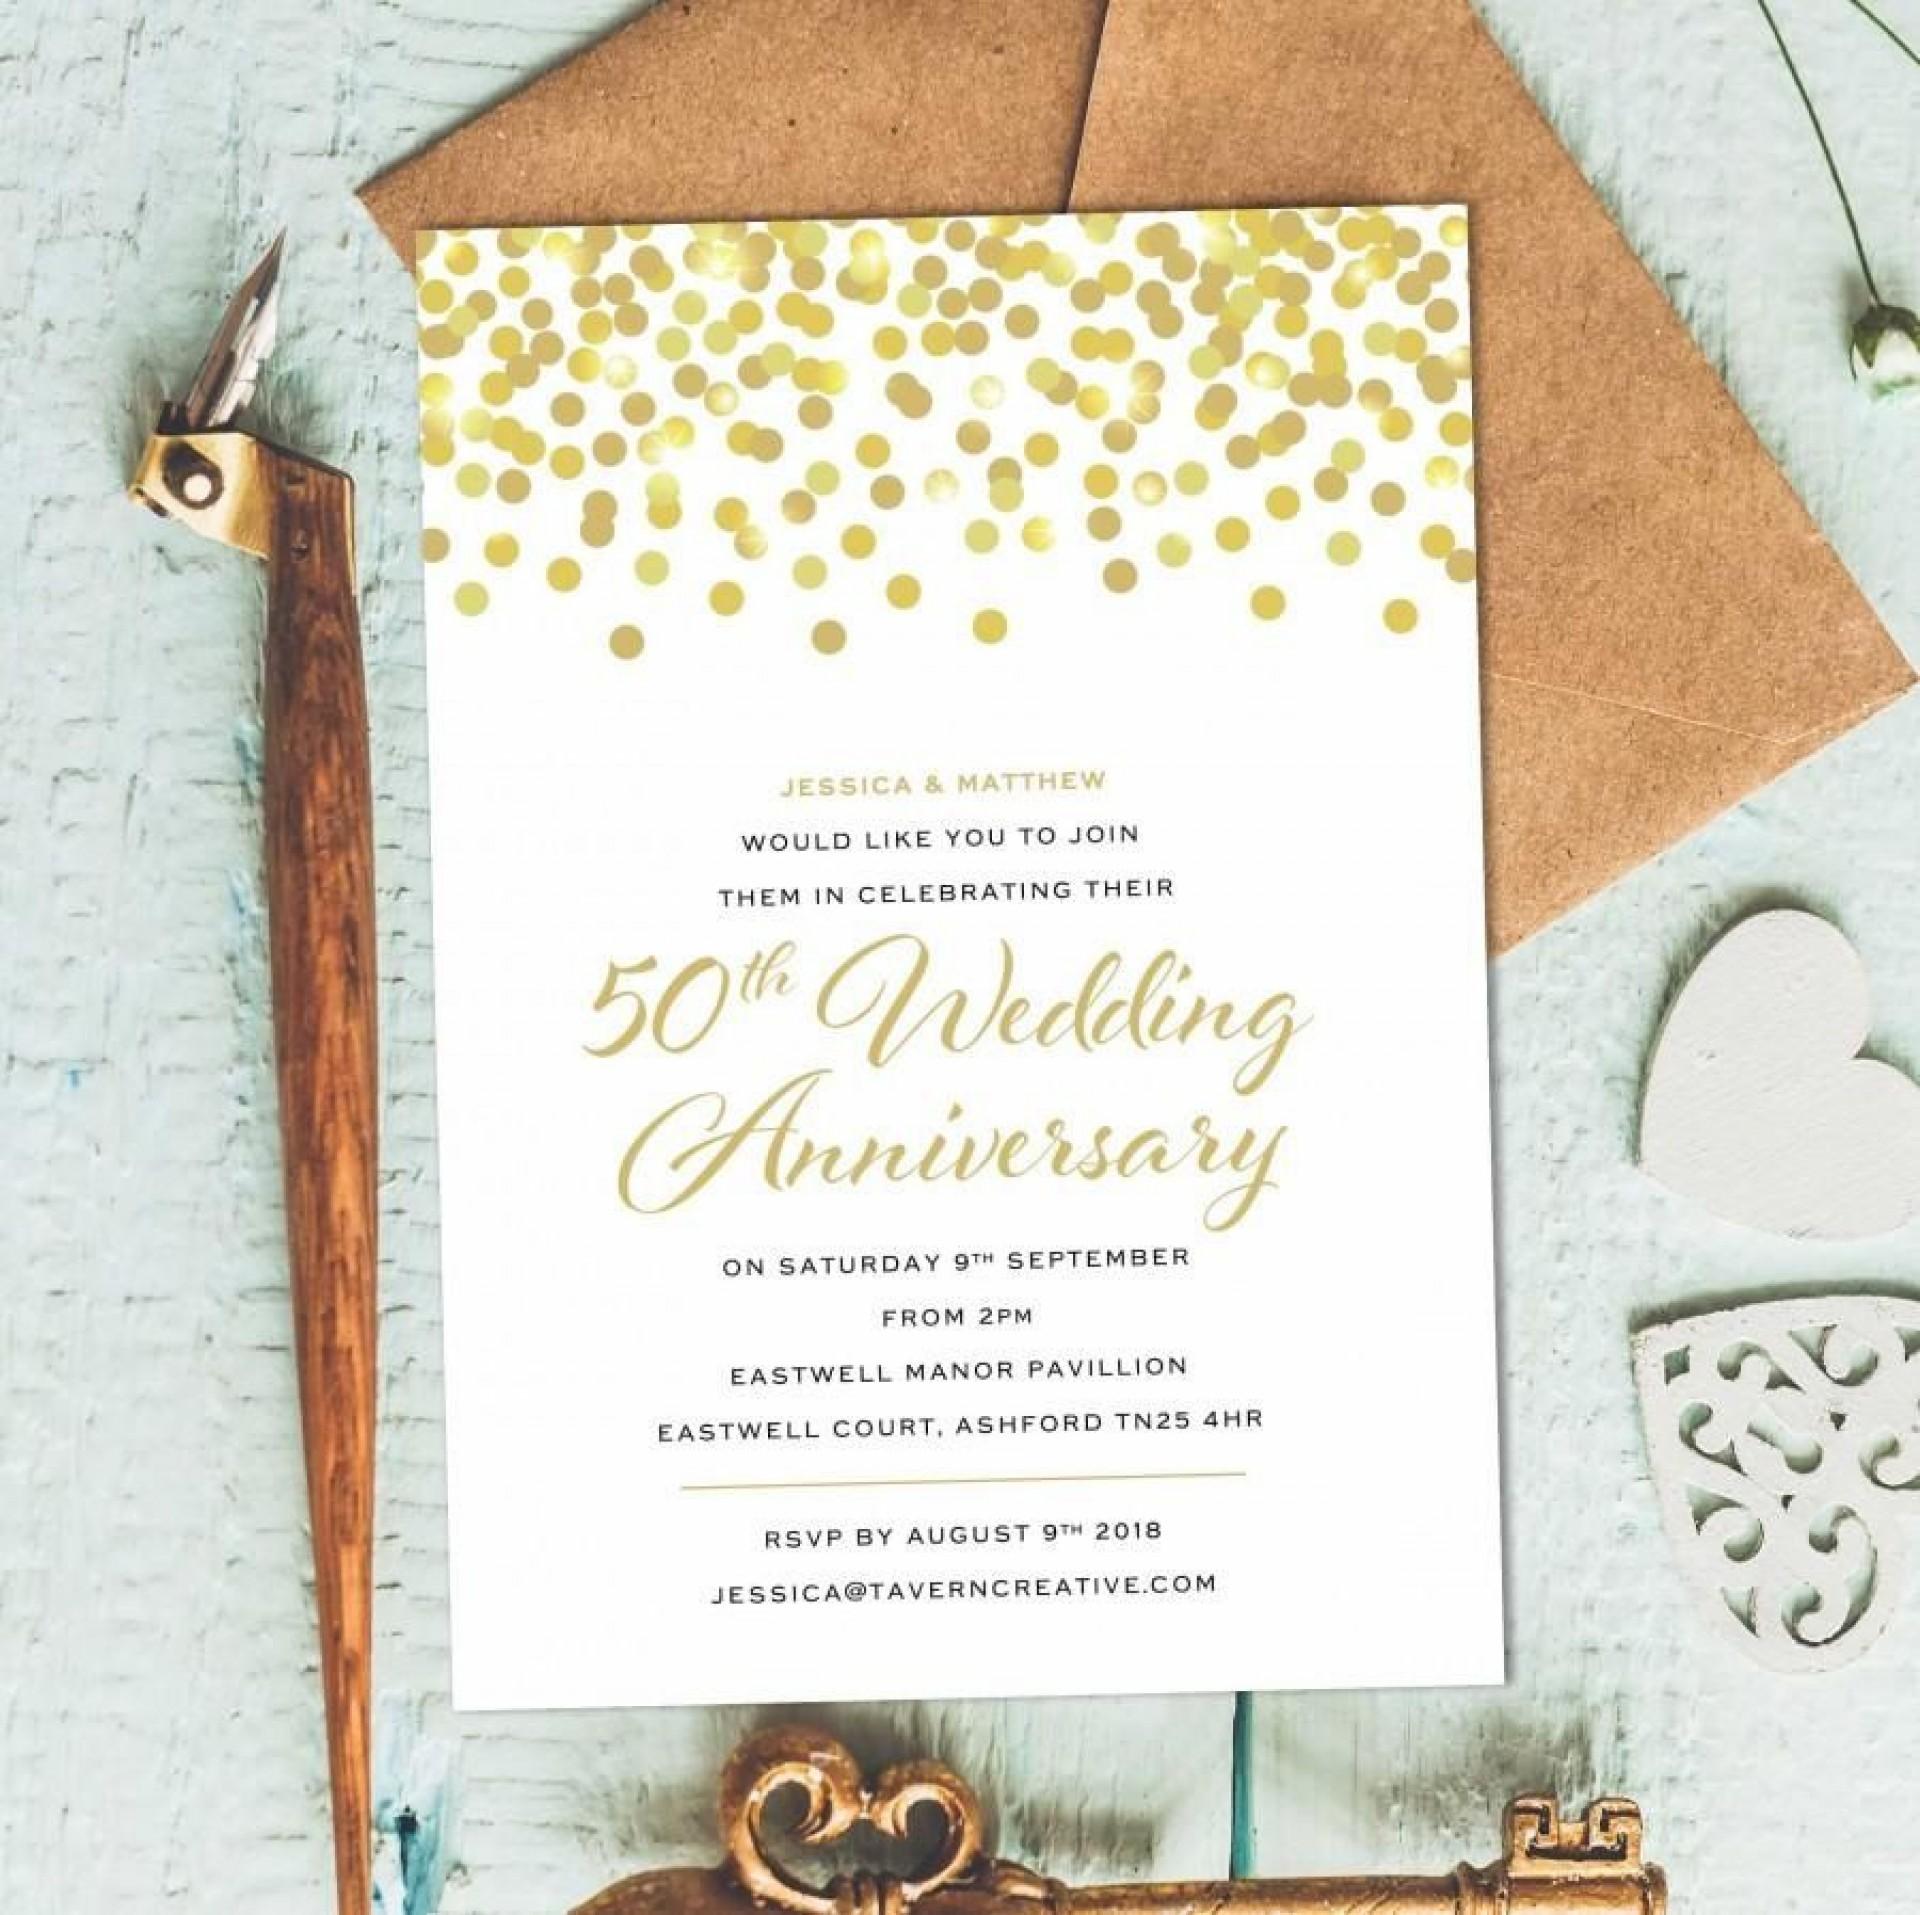 001 Stunning 50th Anniversary Party Invitation Template High Resolution  Templates Golden Wedding Uk Microsoft Word Free1920